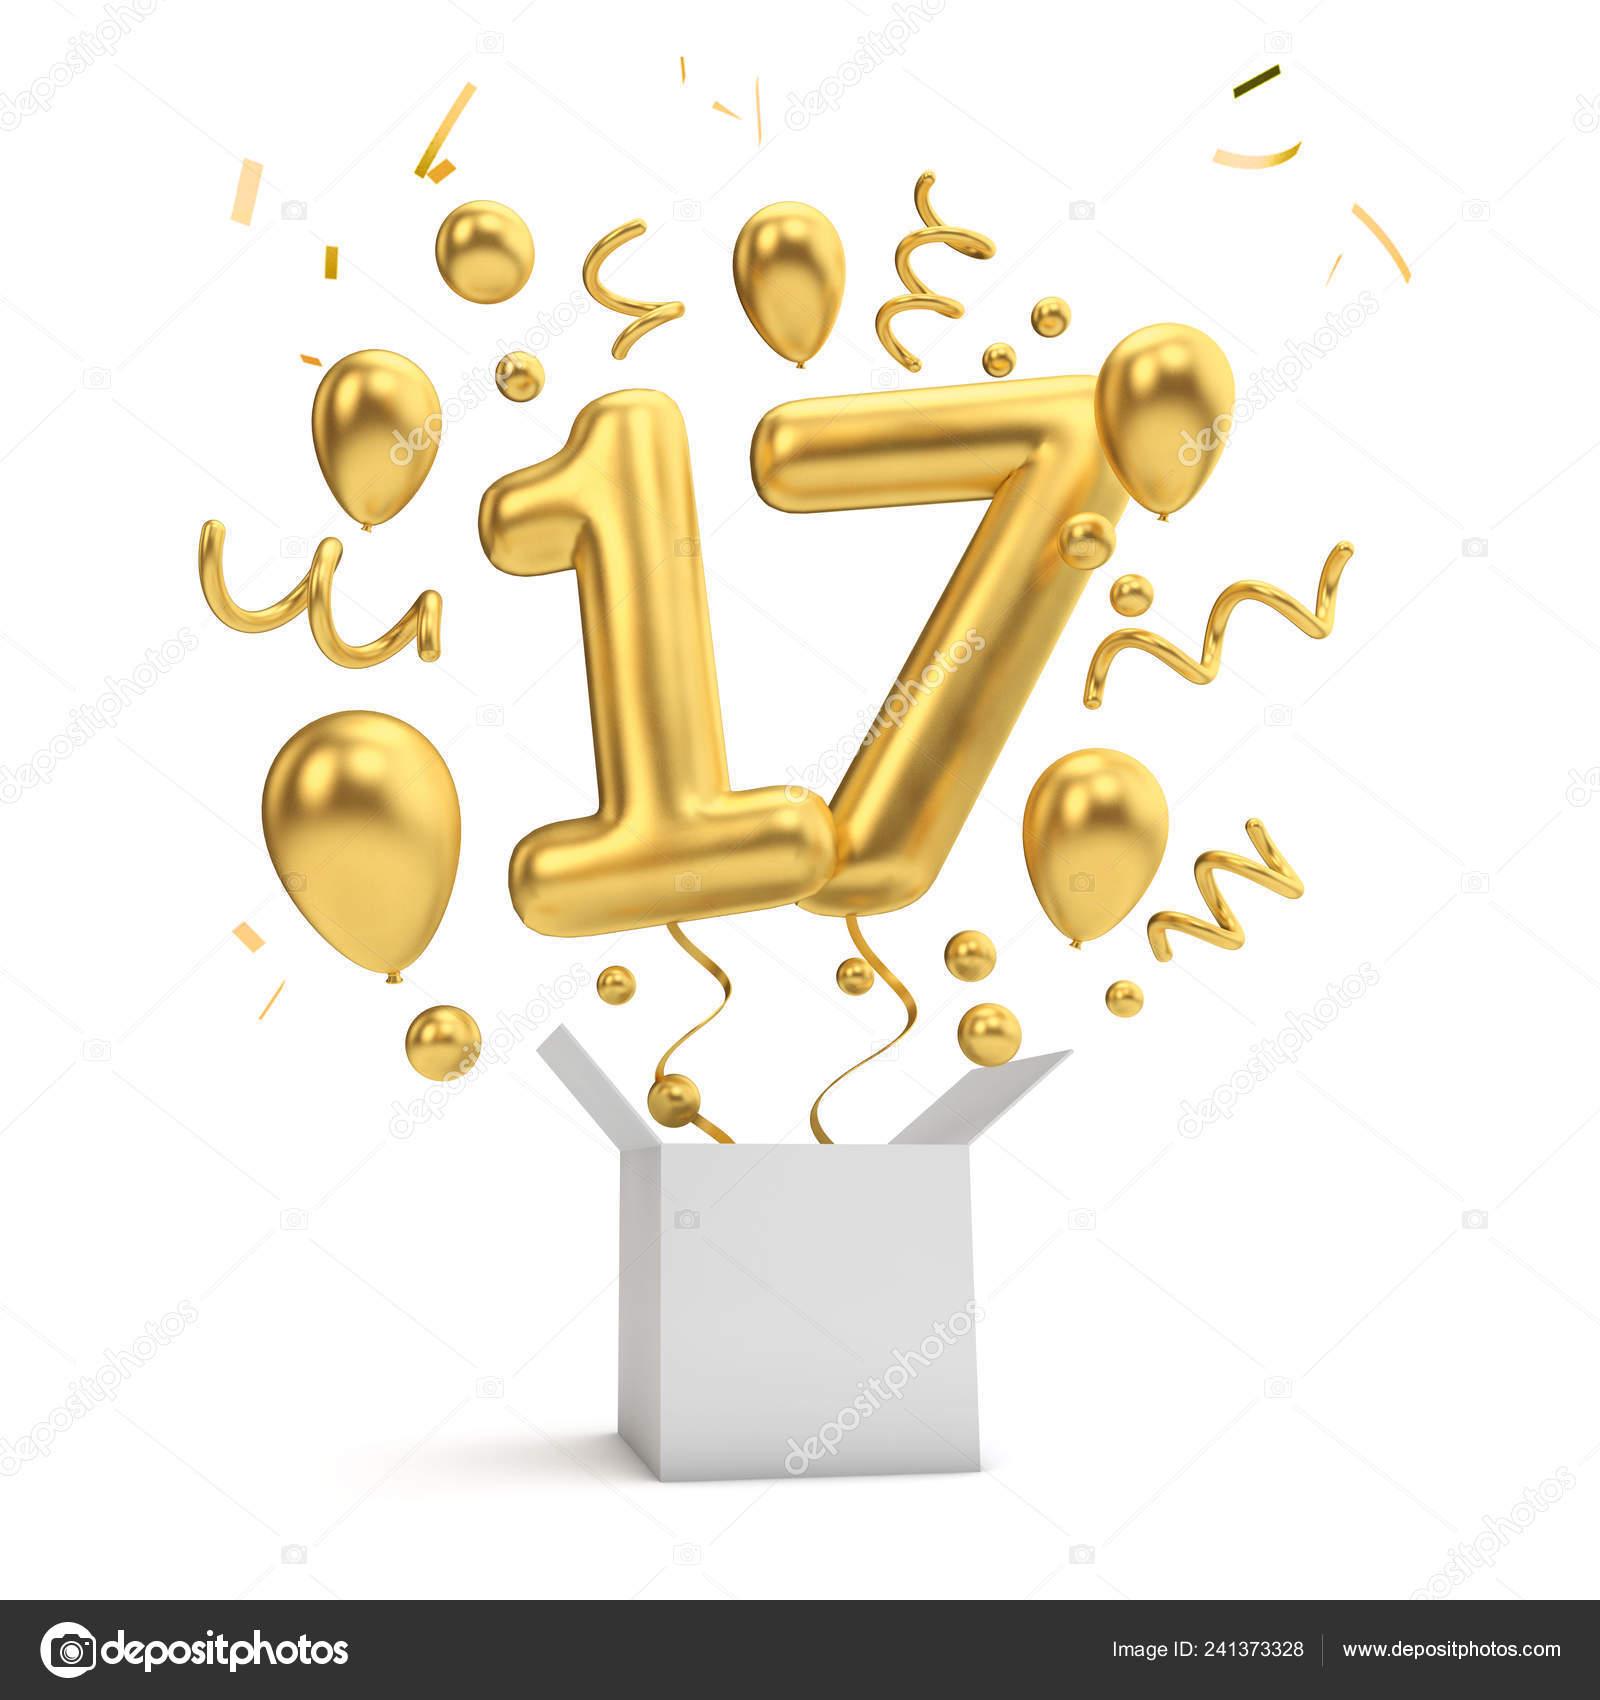 Happy 17th Birthday Gold Surprise Balloon Box Rendering Stock